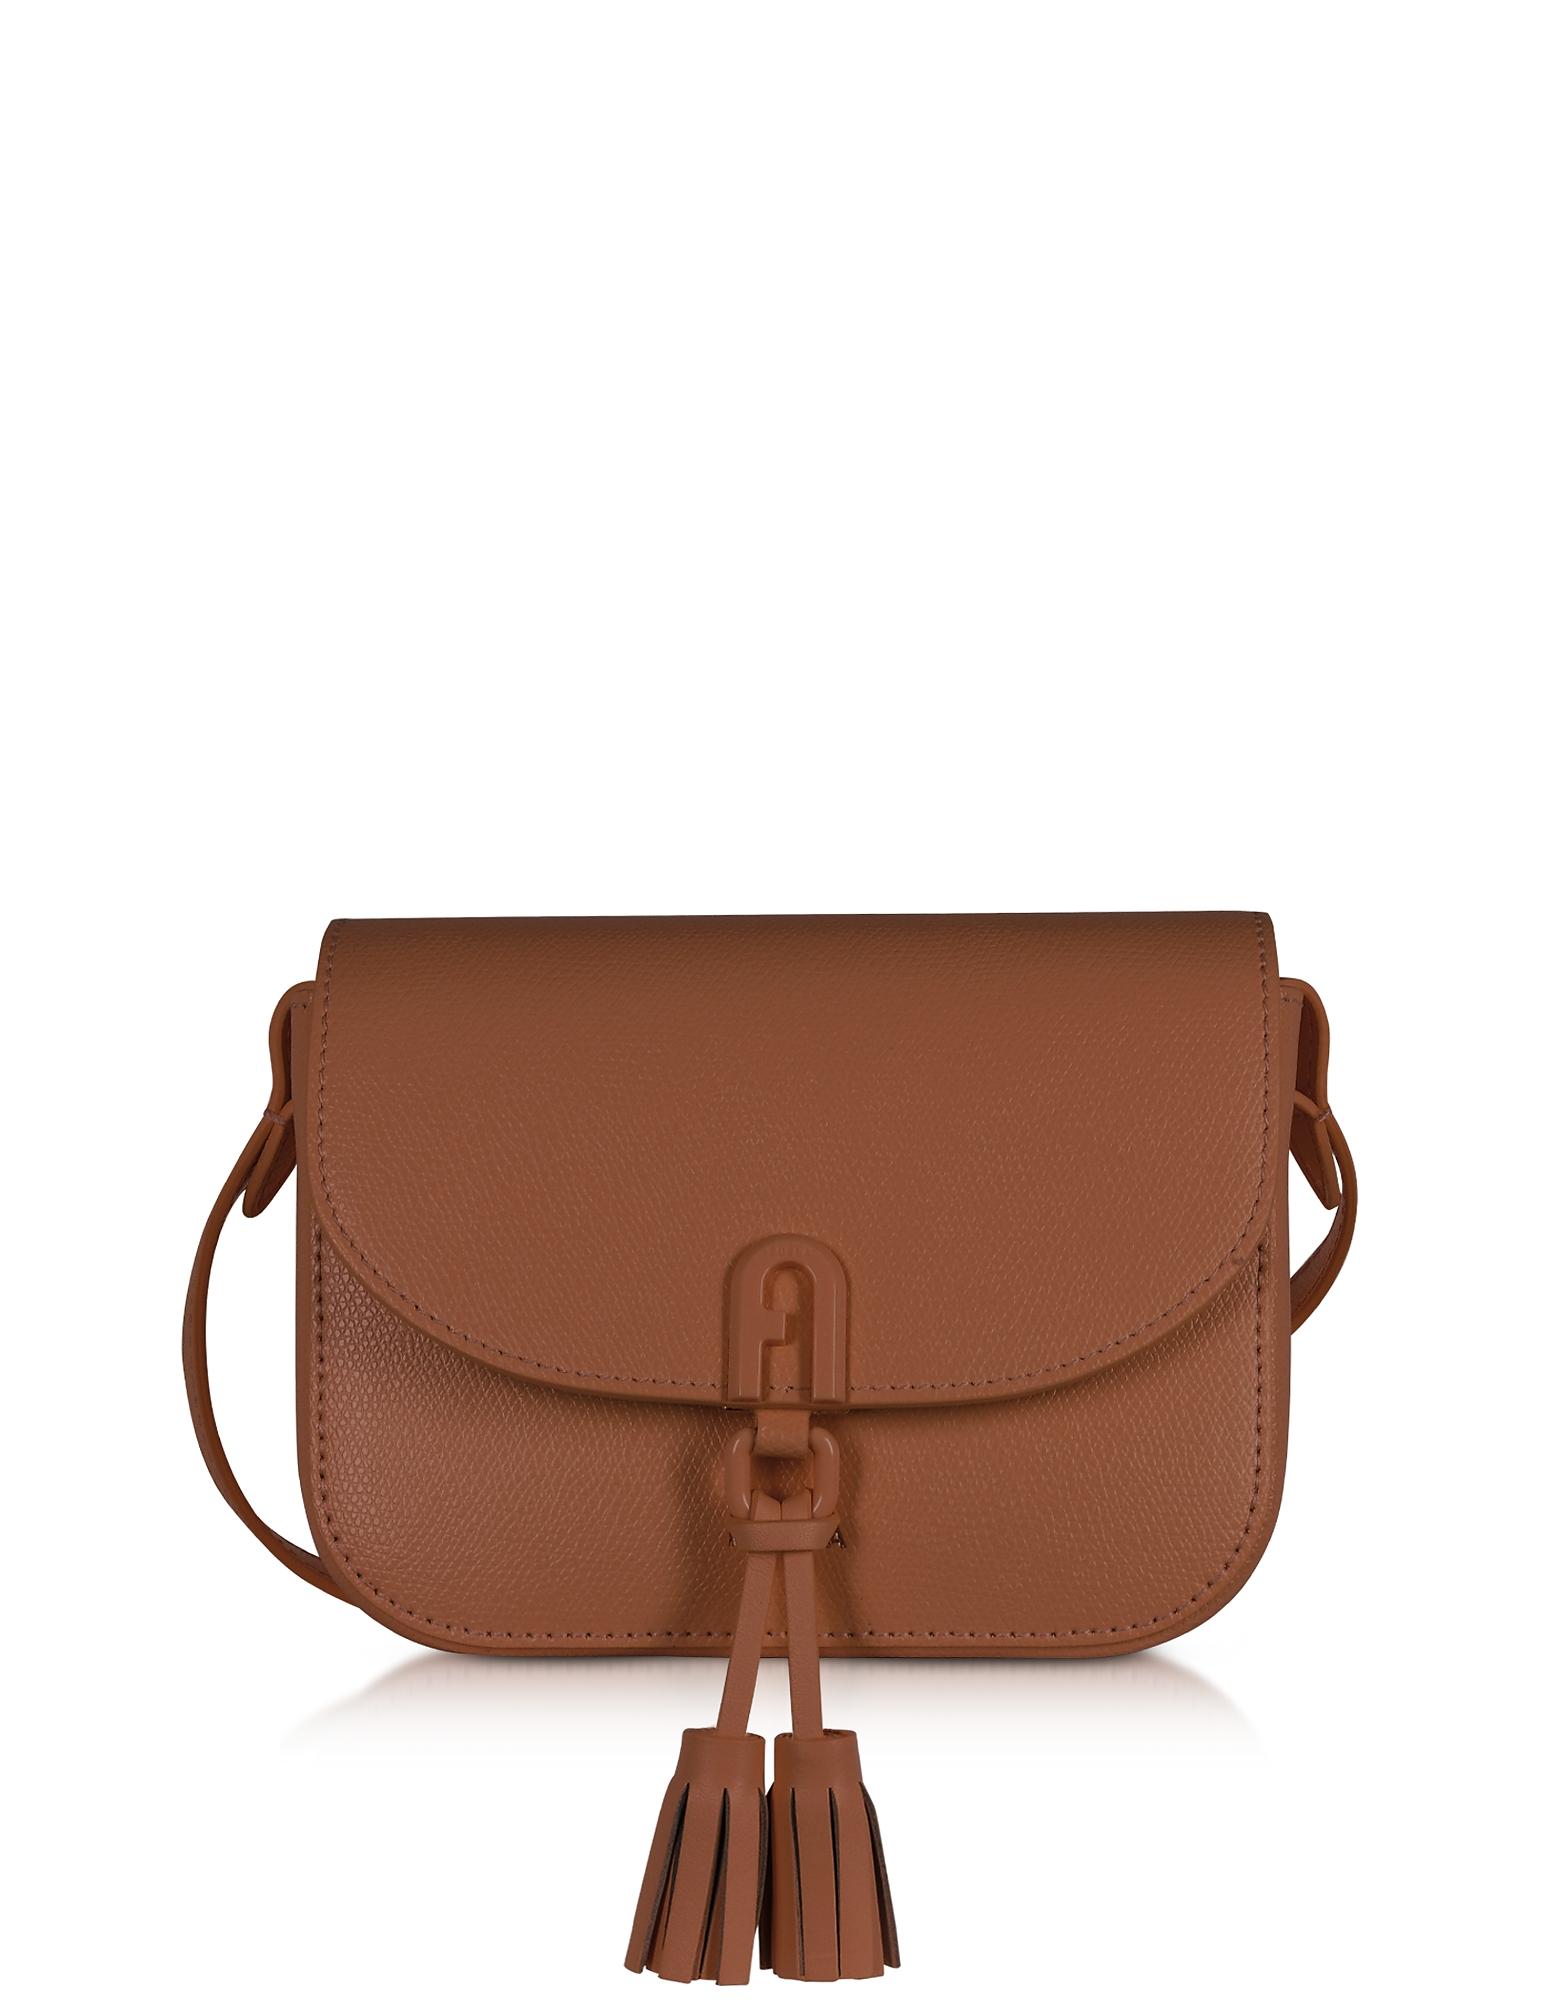 Furla Designer Handbags, 1927 Mini Crossbody Bag 17